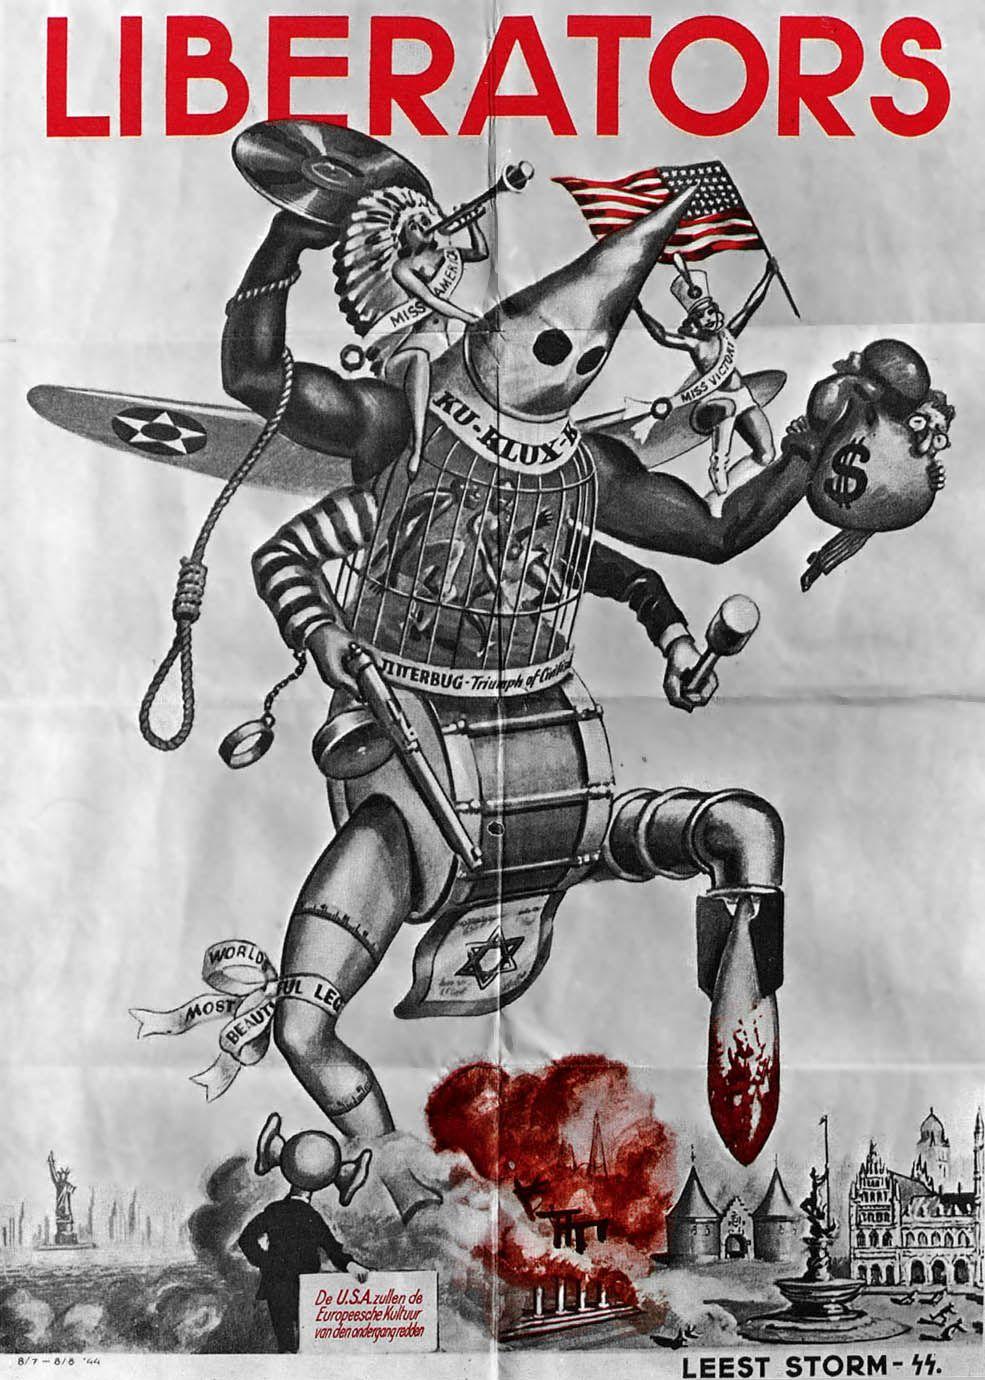 Liberators-Kultur-Terror-Anti-Americanism-1944-Nazi-Propaganda-Poster.jpg (JPEG Image, 985 × 1380 pixels)